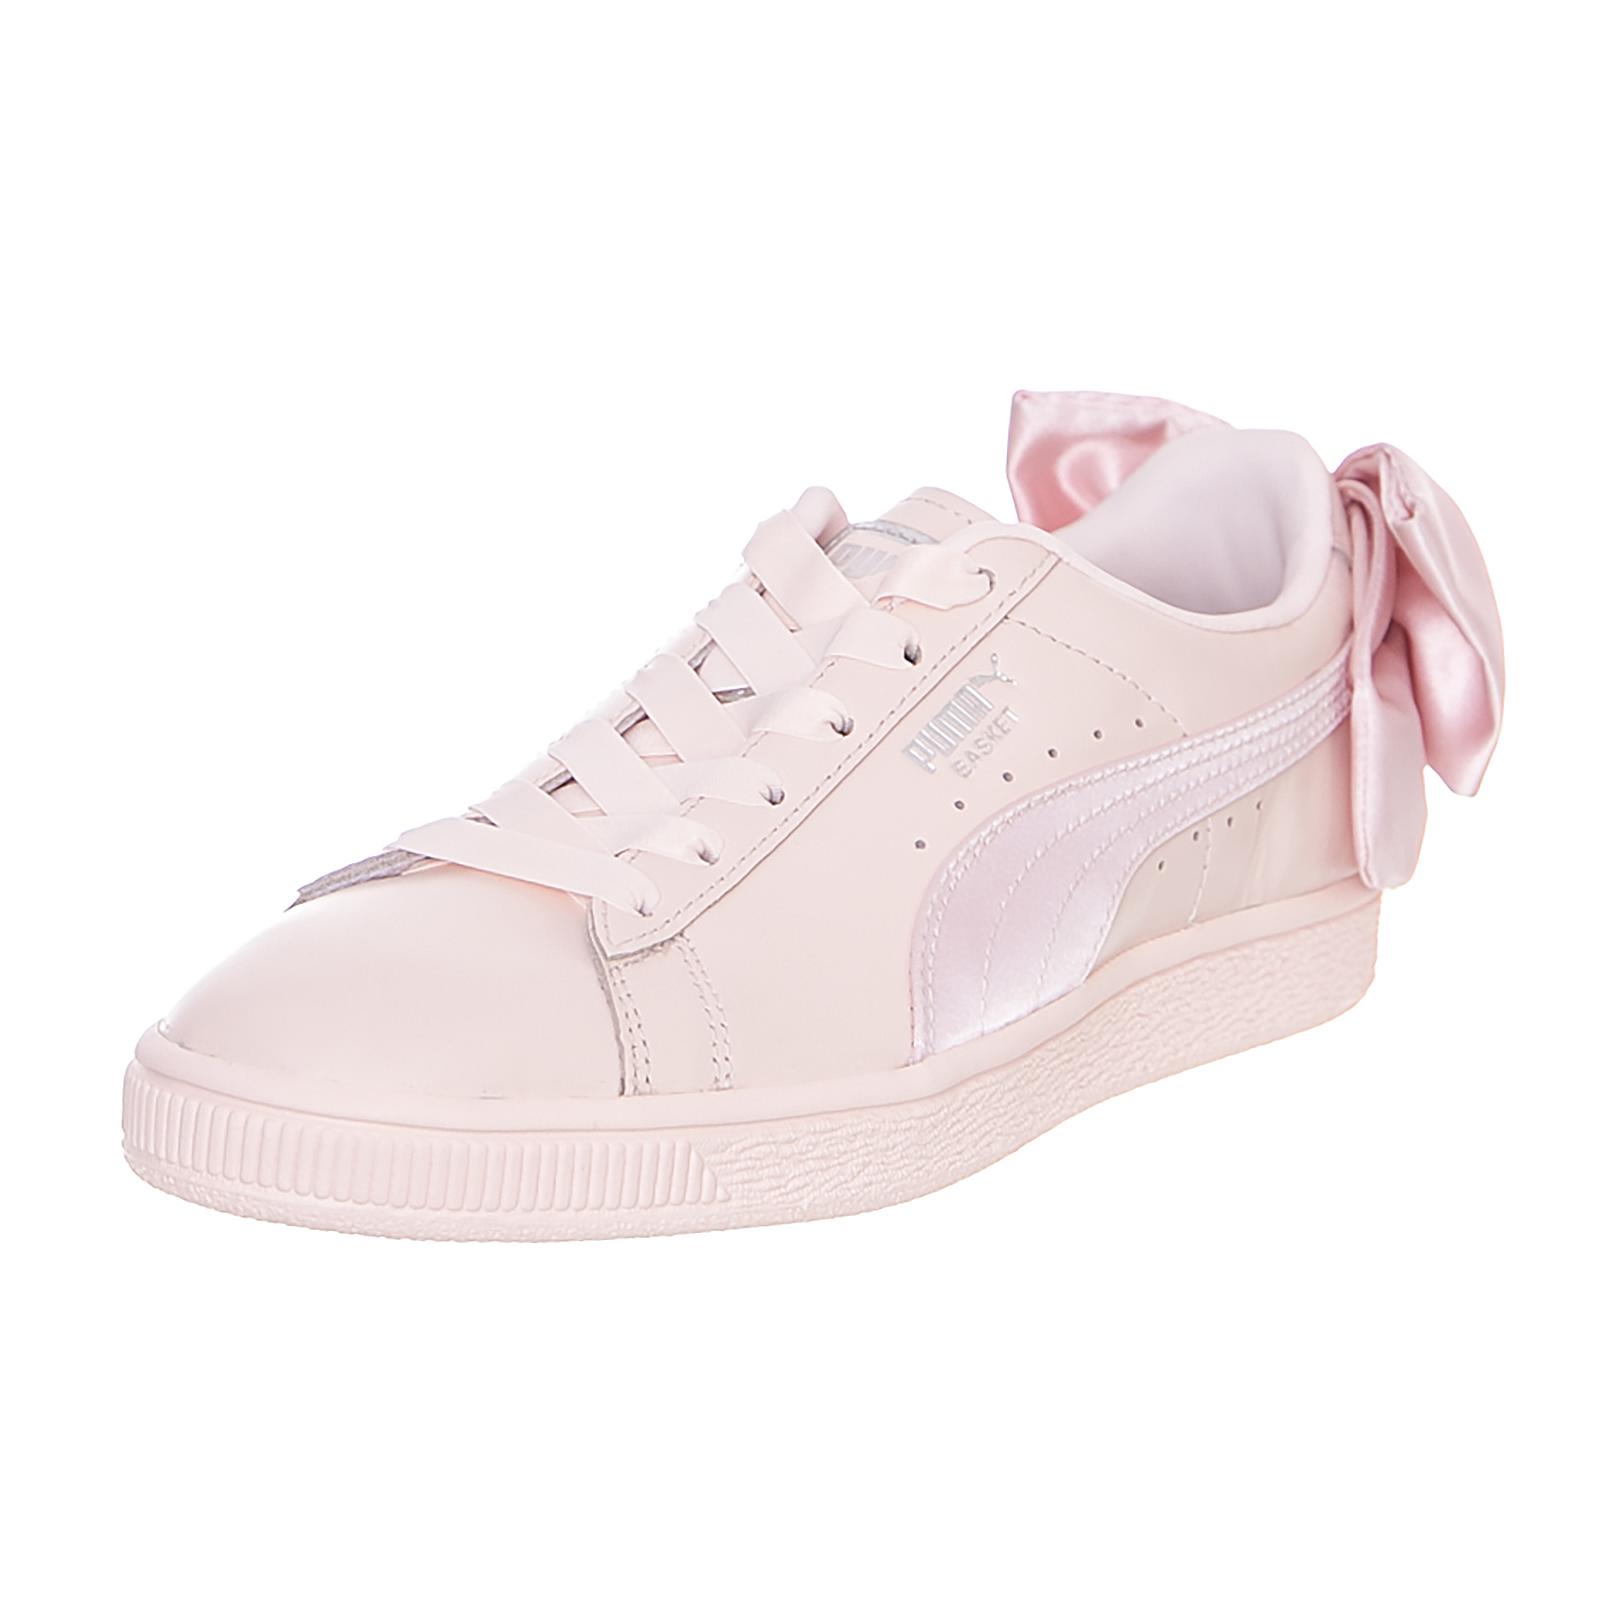 Puma - turnschuhen korb bogen als s pearl pearl pink